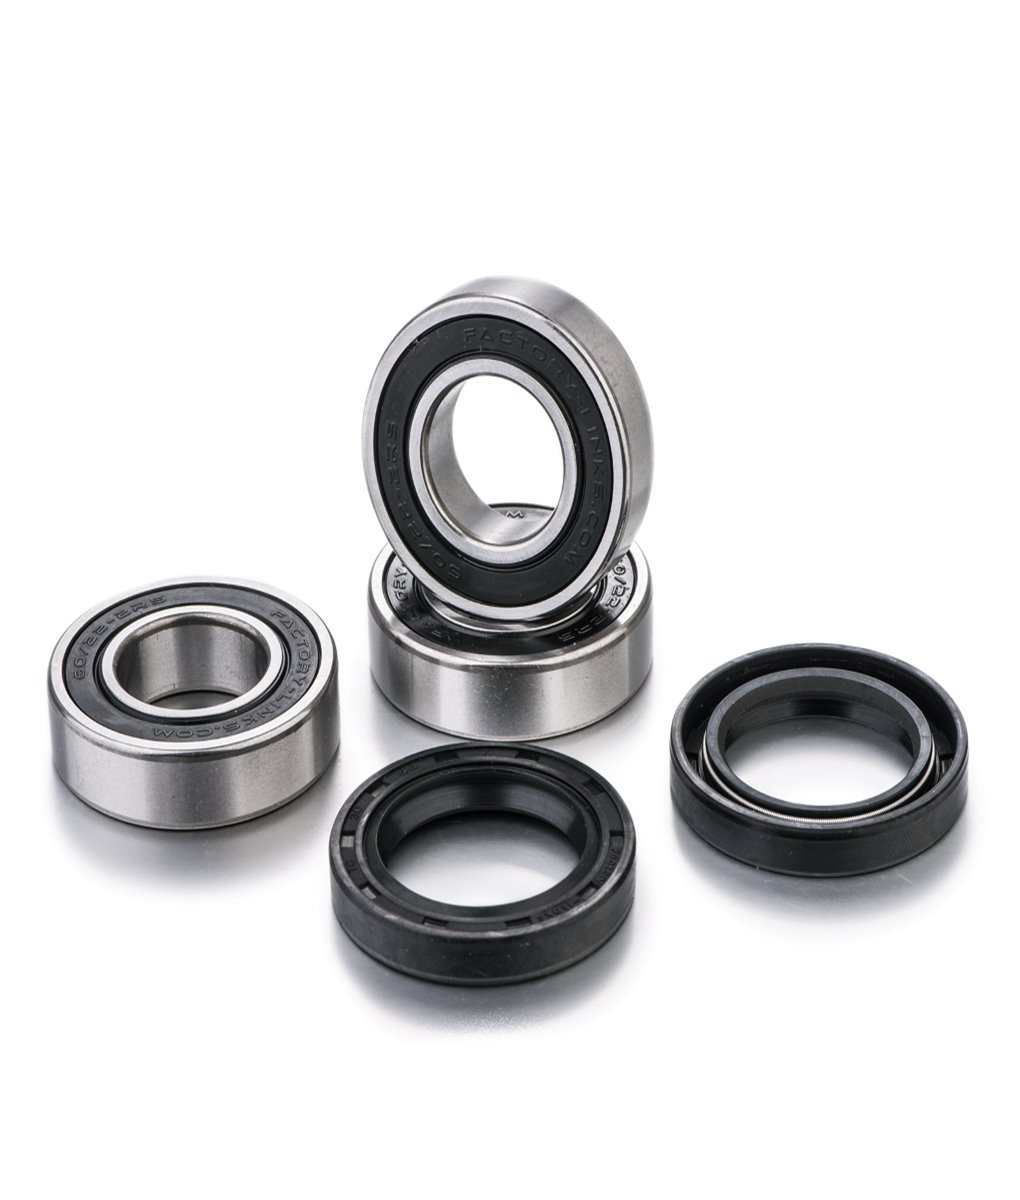 RM 250 2000-2008 : RM 125 Factory-Links Rear Wheel Bearing Kits Fits: Suzuki